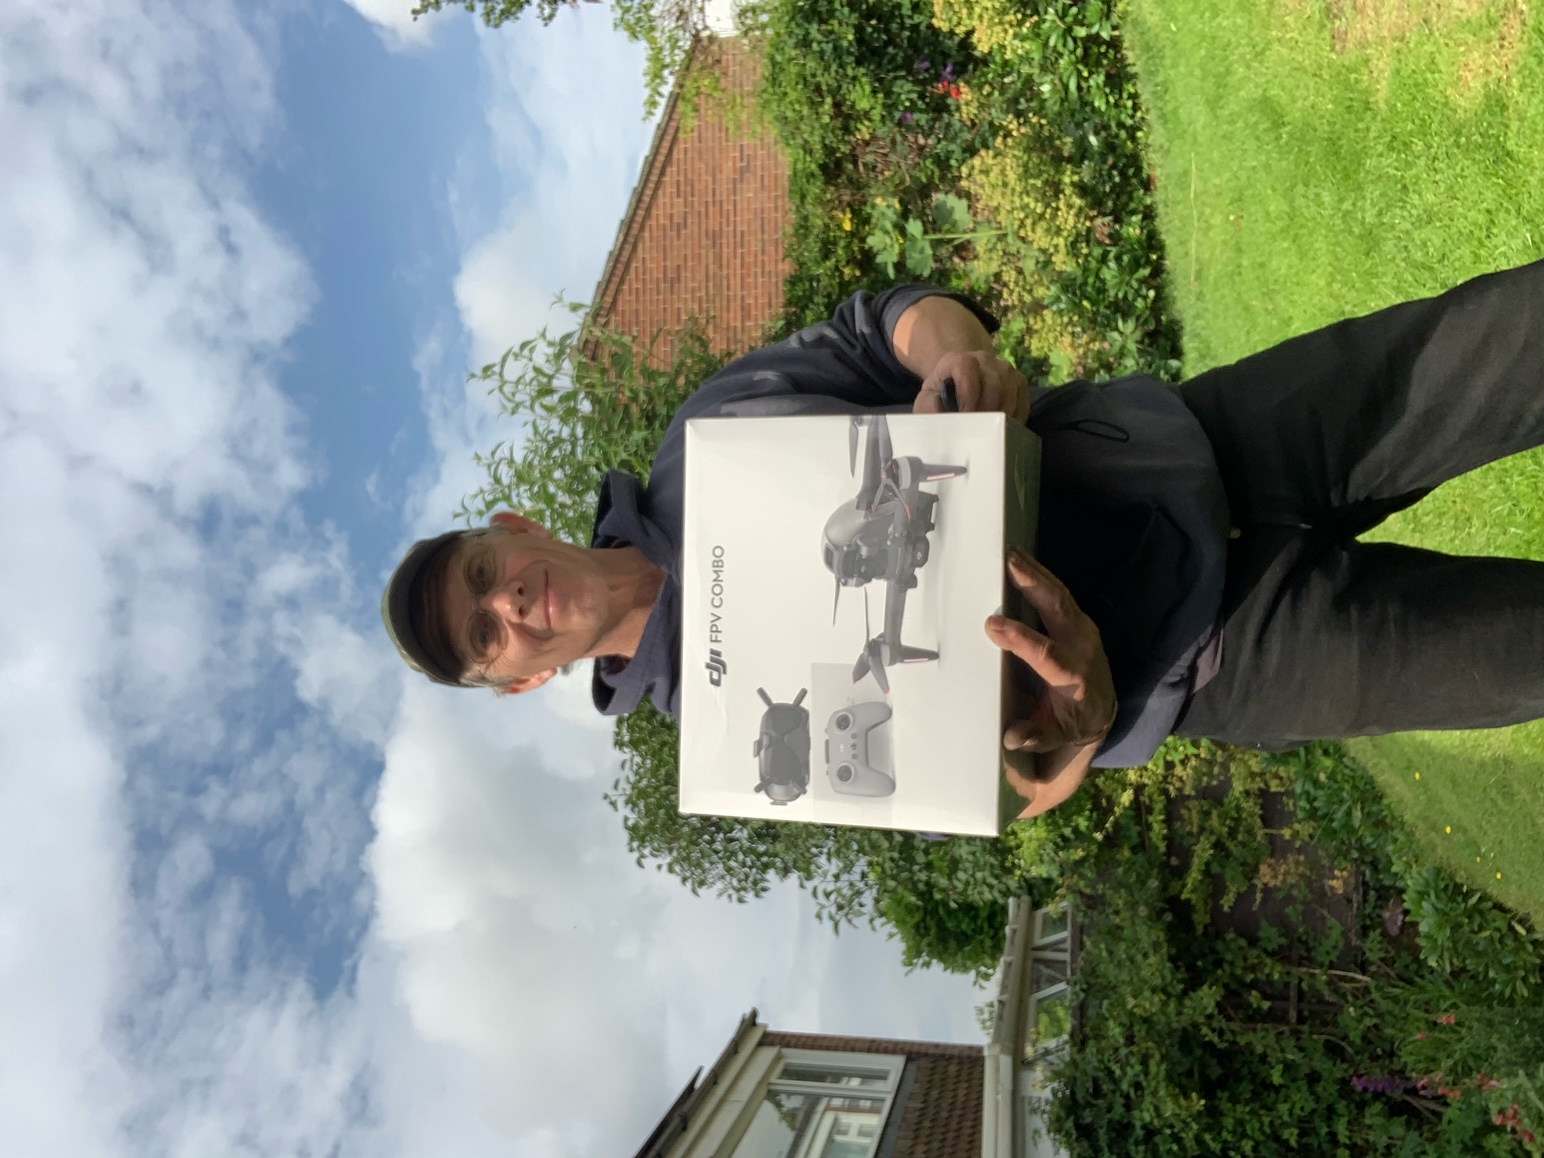 Winner Gary Huston of a DJI Drone FPV Combo - 28th June